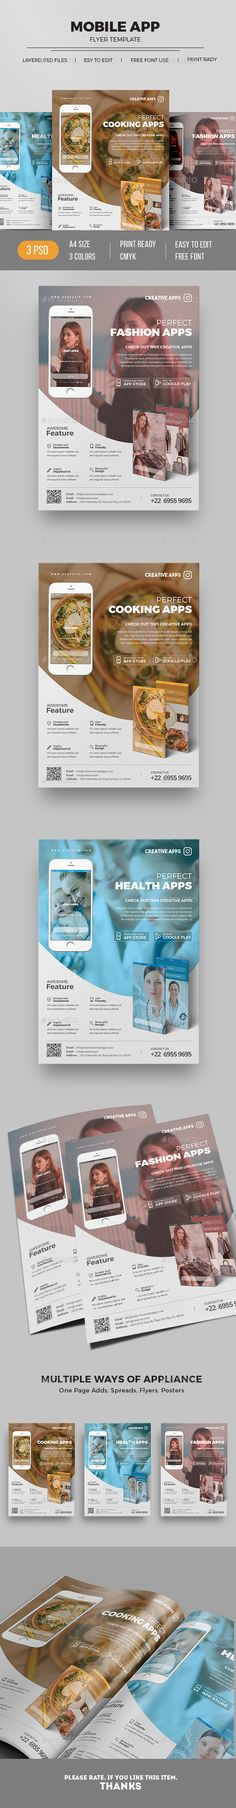 Mobile App Flyer — Photoshop PSD #mobile application flyer #business • Download ➝ https://graphicriver.net/item/mobile-app-flyer/19534728?ref=pxcr